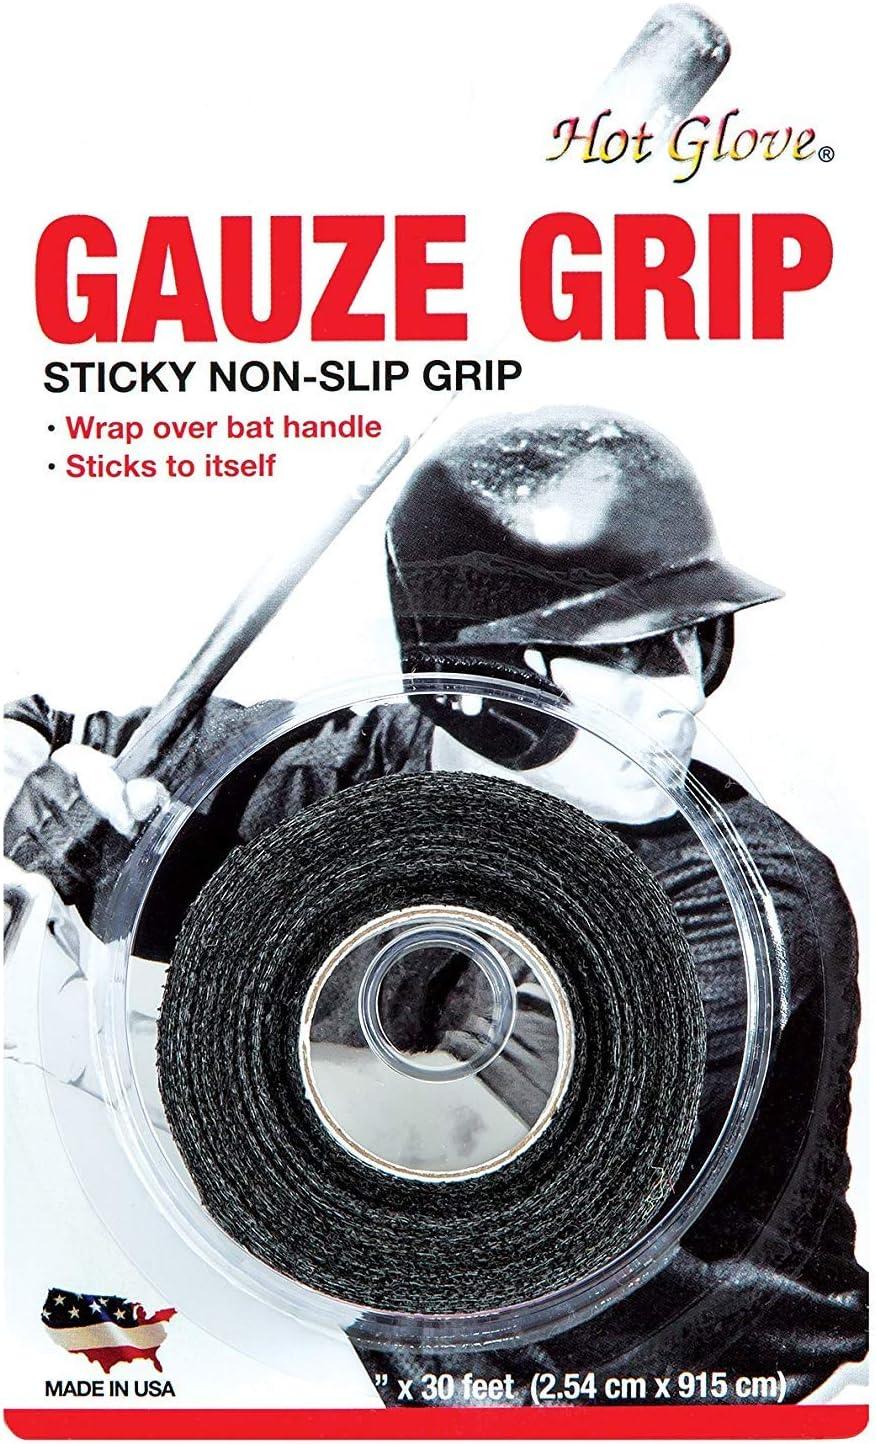 Unique Athletic-baseball /& Softball Gauze Grip Bat Tape Each Roll 2209 2-Pack